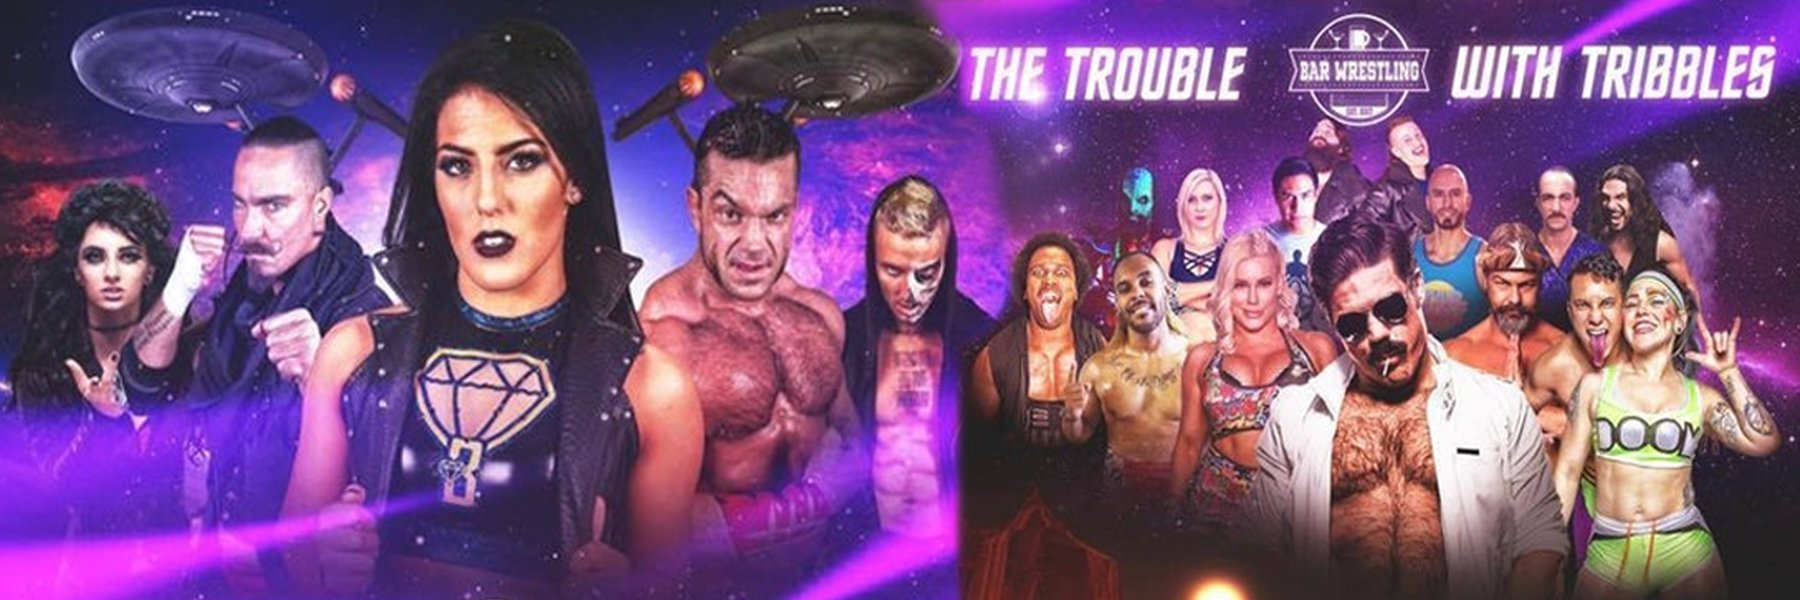 New Bar Wrestling! See Tessa Blanchard, Priscilla Kelly, Joey Ryan, Cage